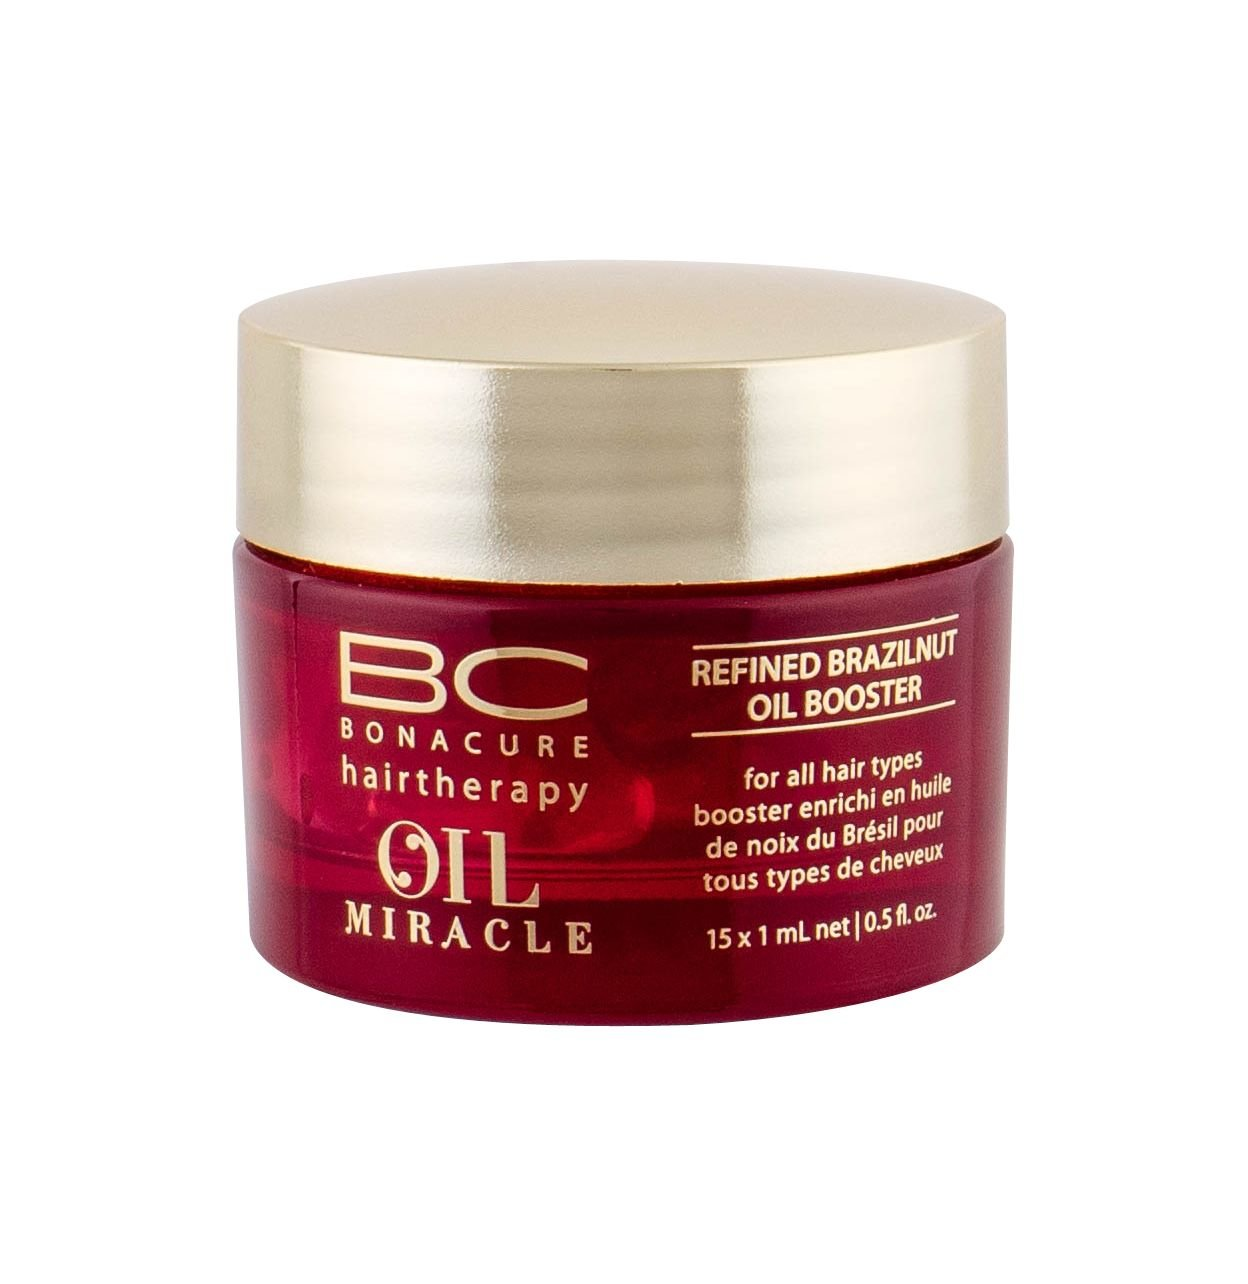 Schwarzkopf BC Bonacure Oil Miracle Hair Oils and Serum 15x1ml